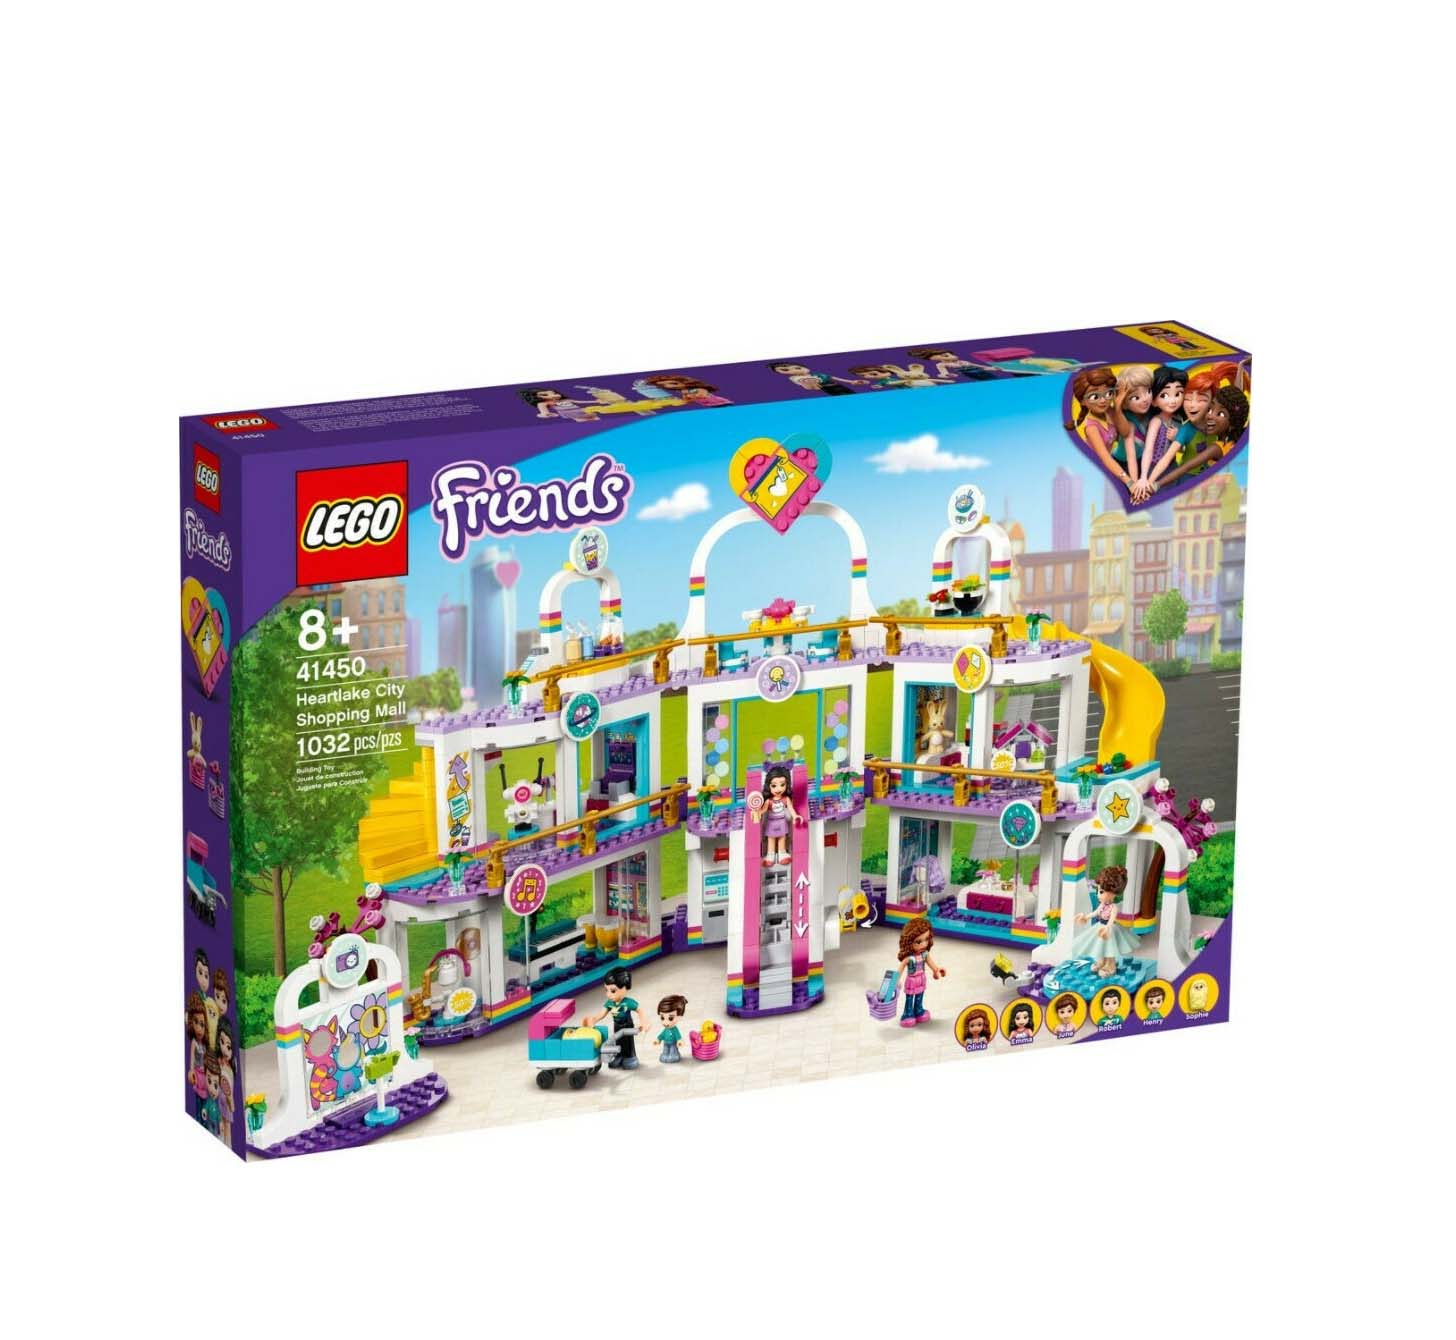 Lego Friends: Heartlake City Shopping Mall 41450